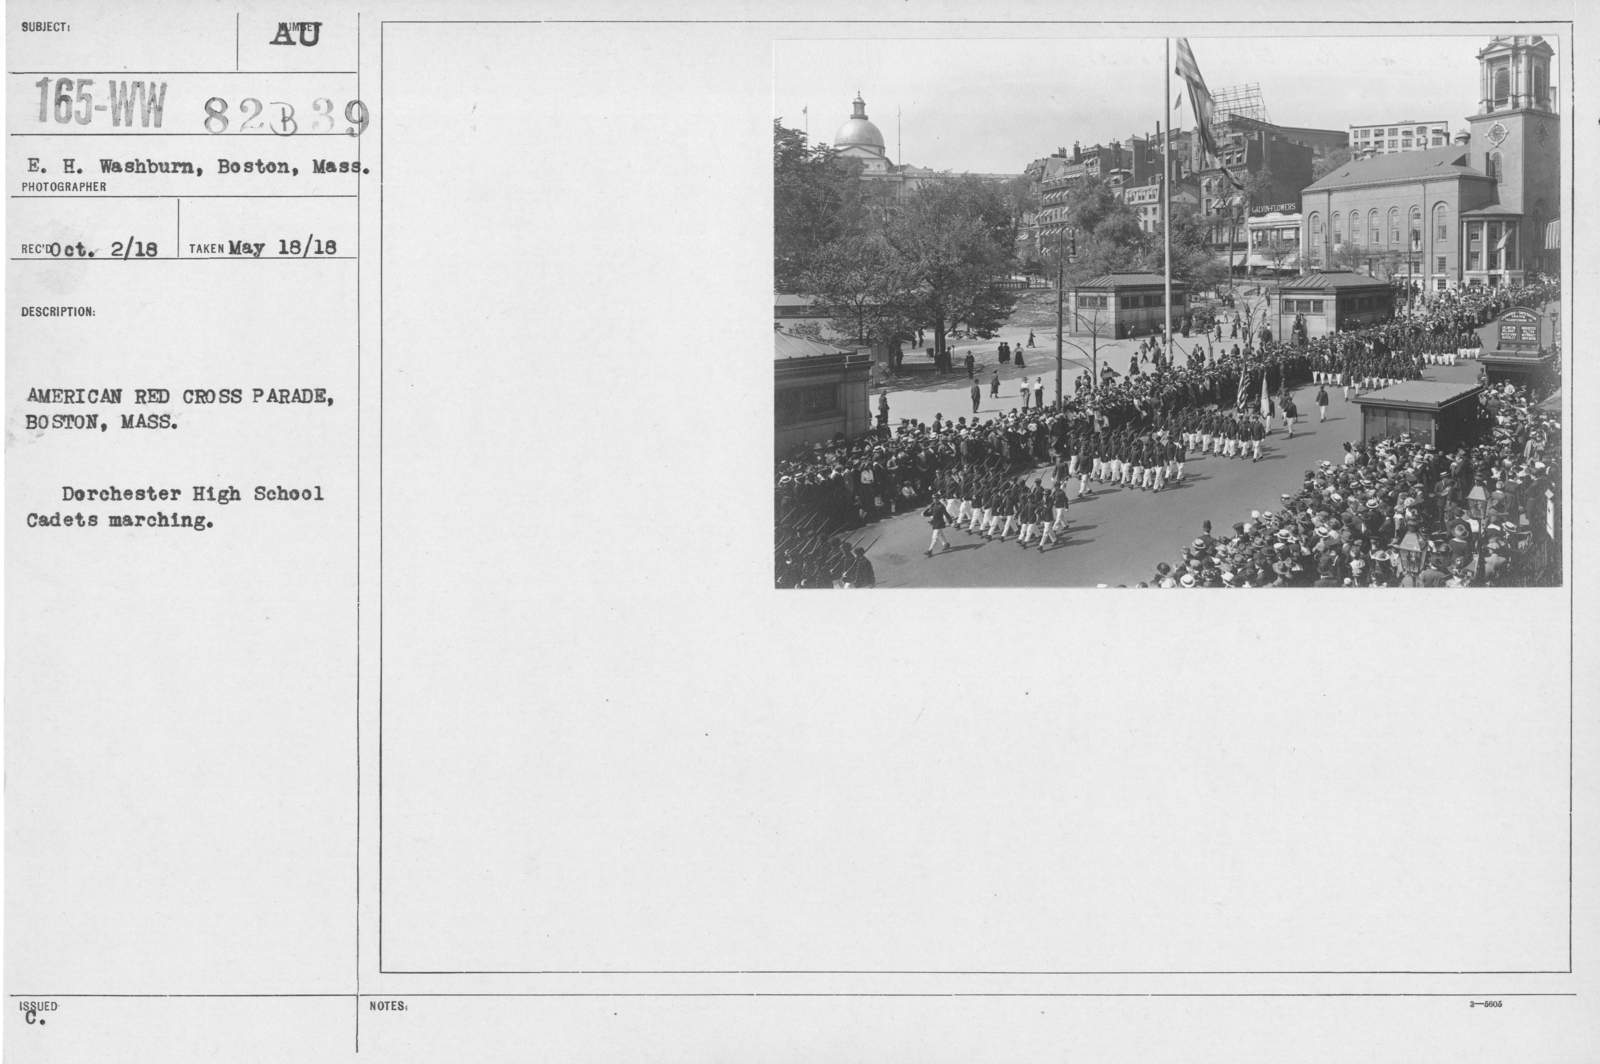 Ceremonies - Illinois thru Massachusetts - American Red Cross parade, Boston, Mass. Dorchester High School Cadets marching